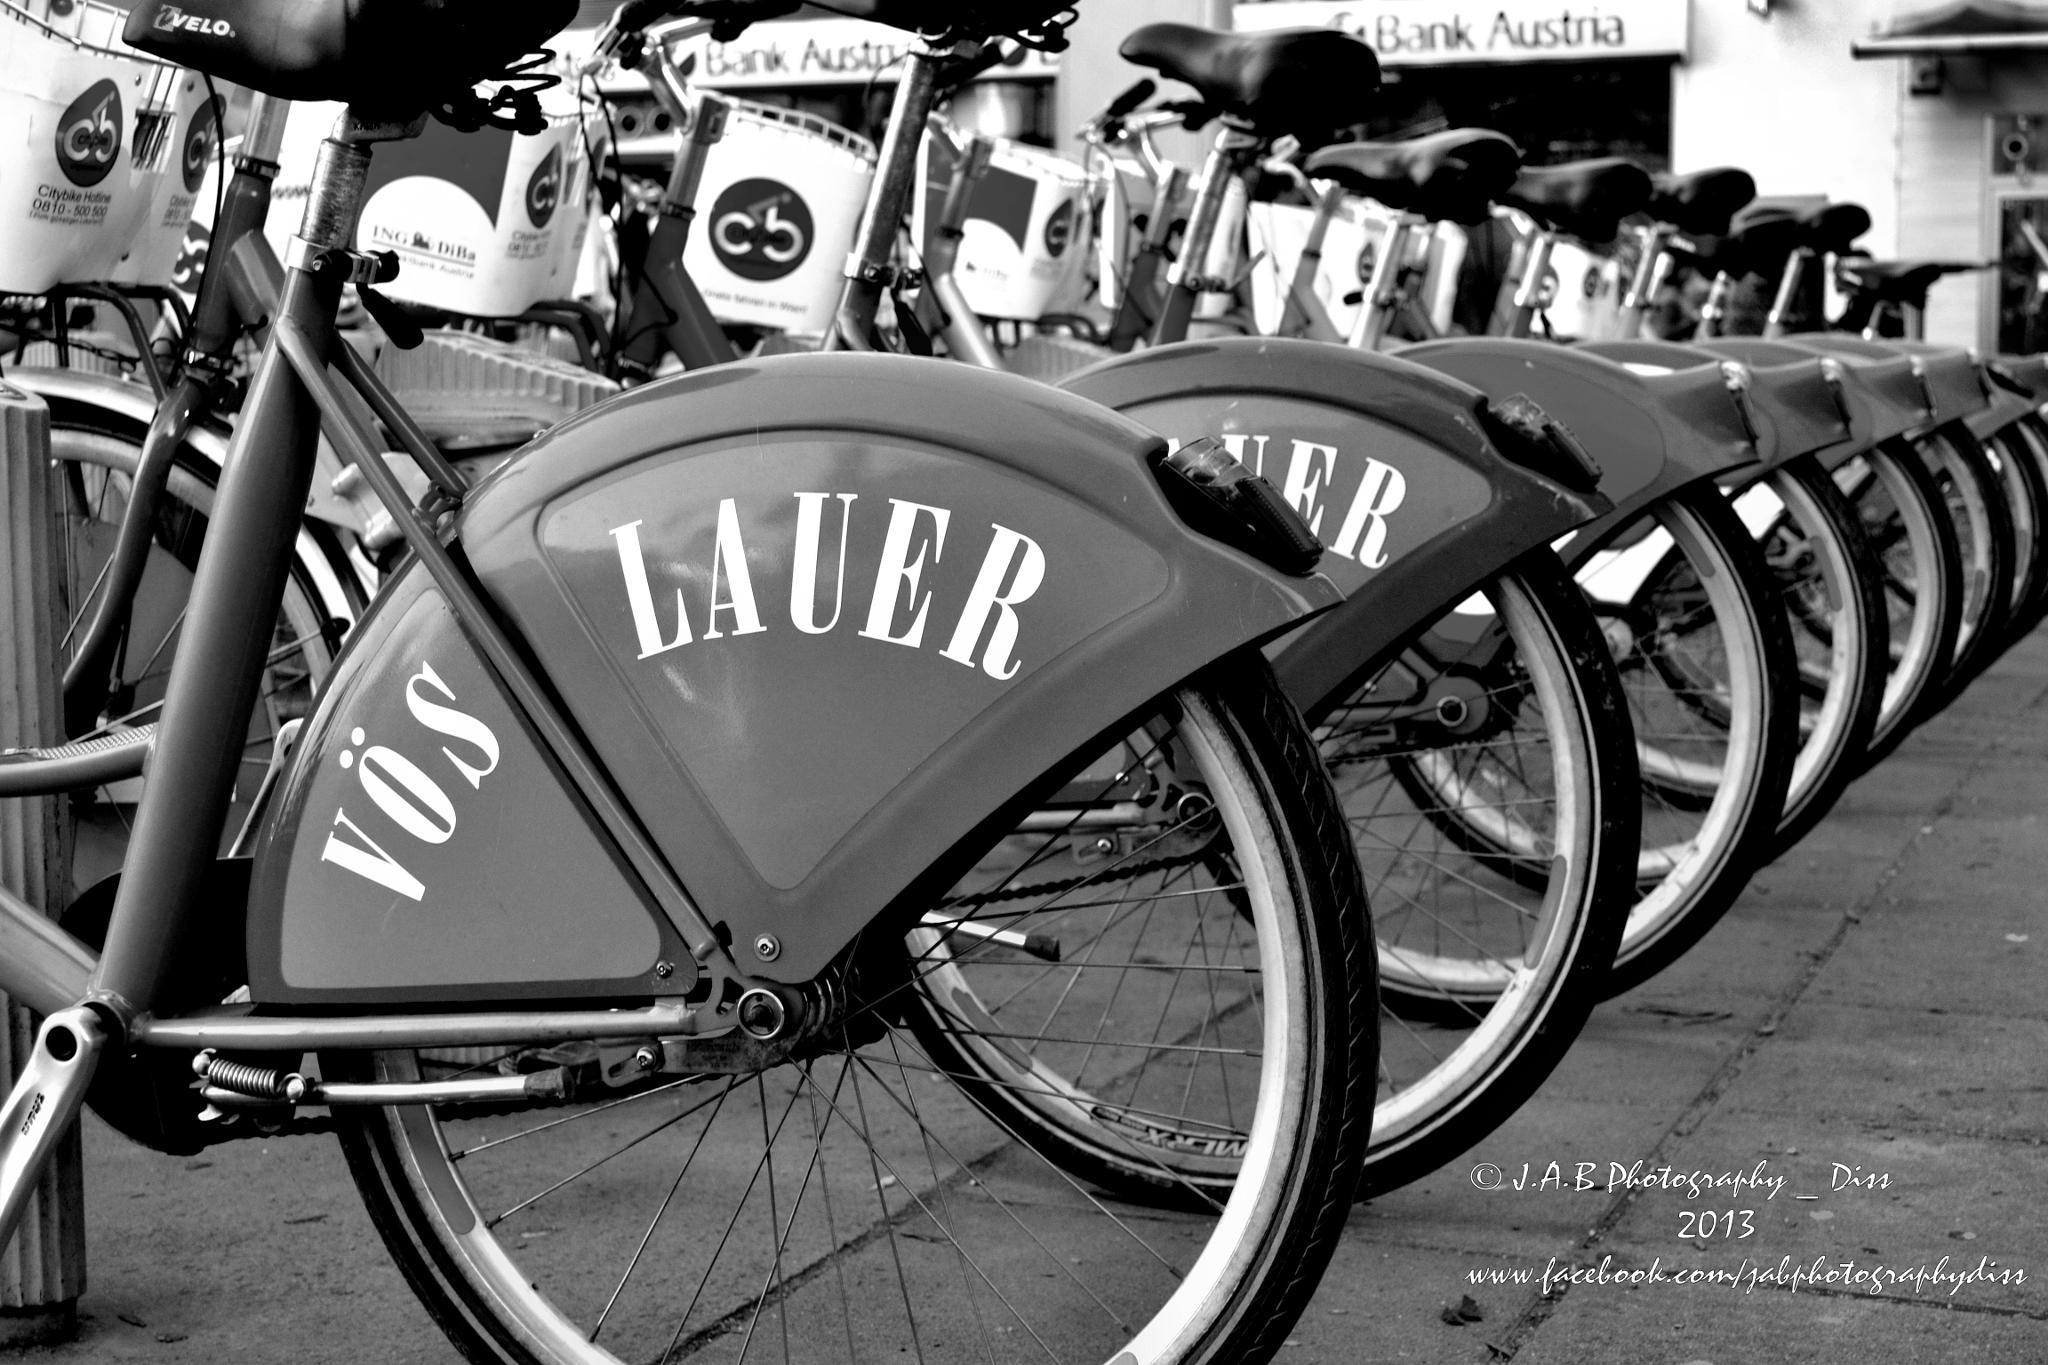 on your bike by J Allan Black